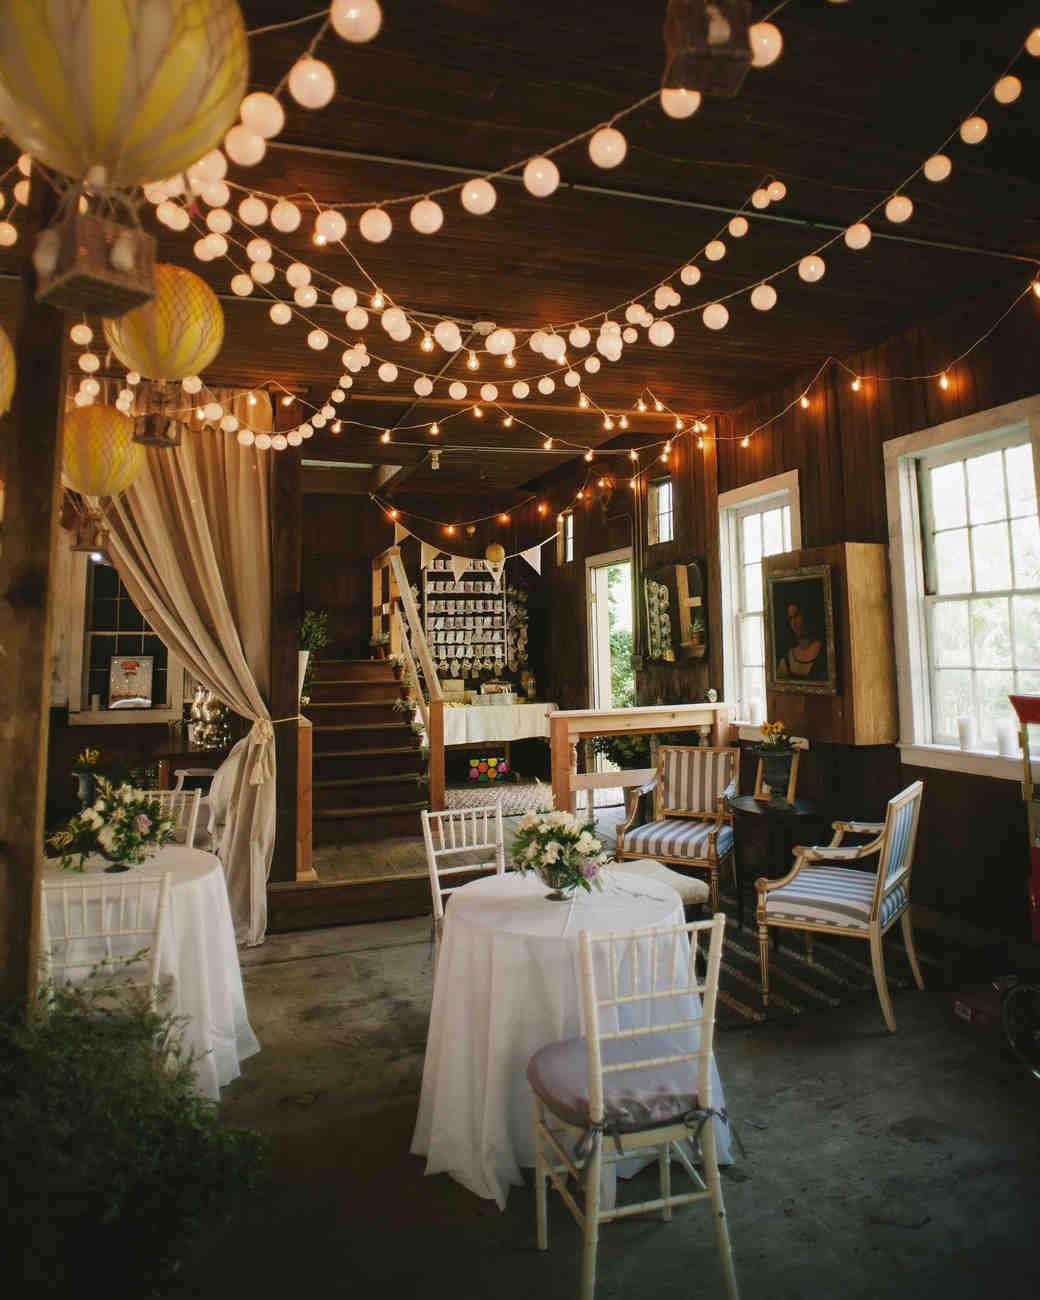 Barn Style Wedding In Ma: A Vintage-Inspired Barn Wedding Woodstock, Connecticut